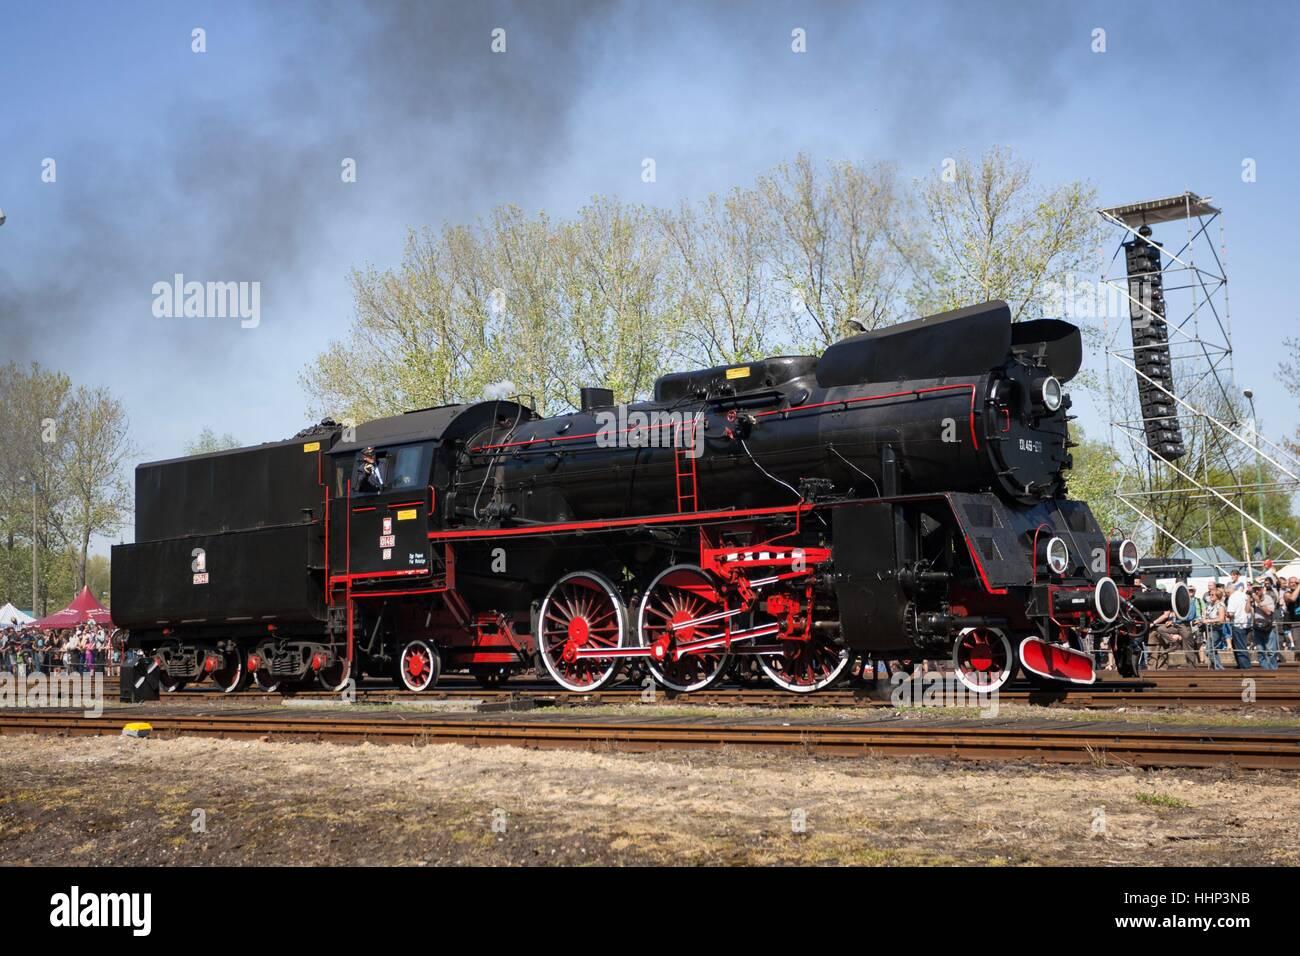 Wolsztyn, Poland - April 28, 2012 Parade of railway locomotives in Wolsztyn in western Poland. Stock Photo